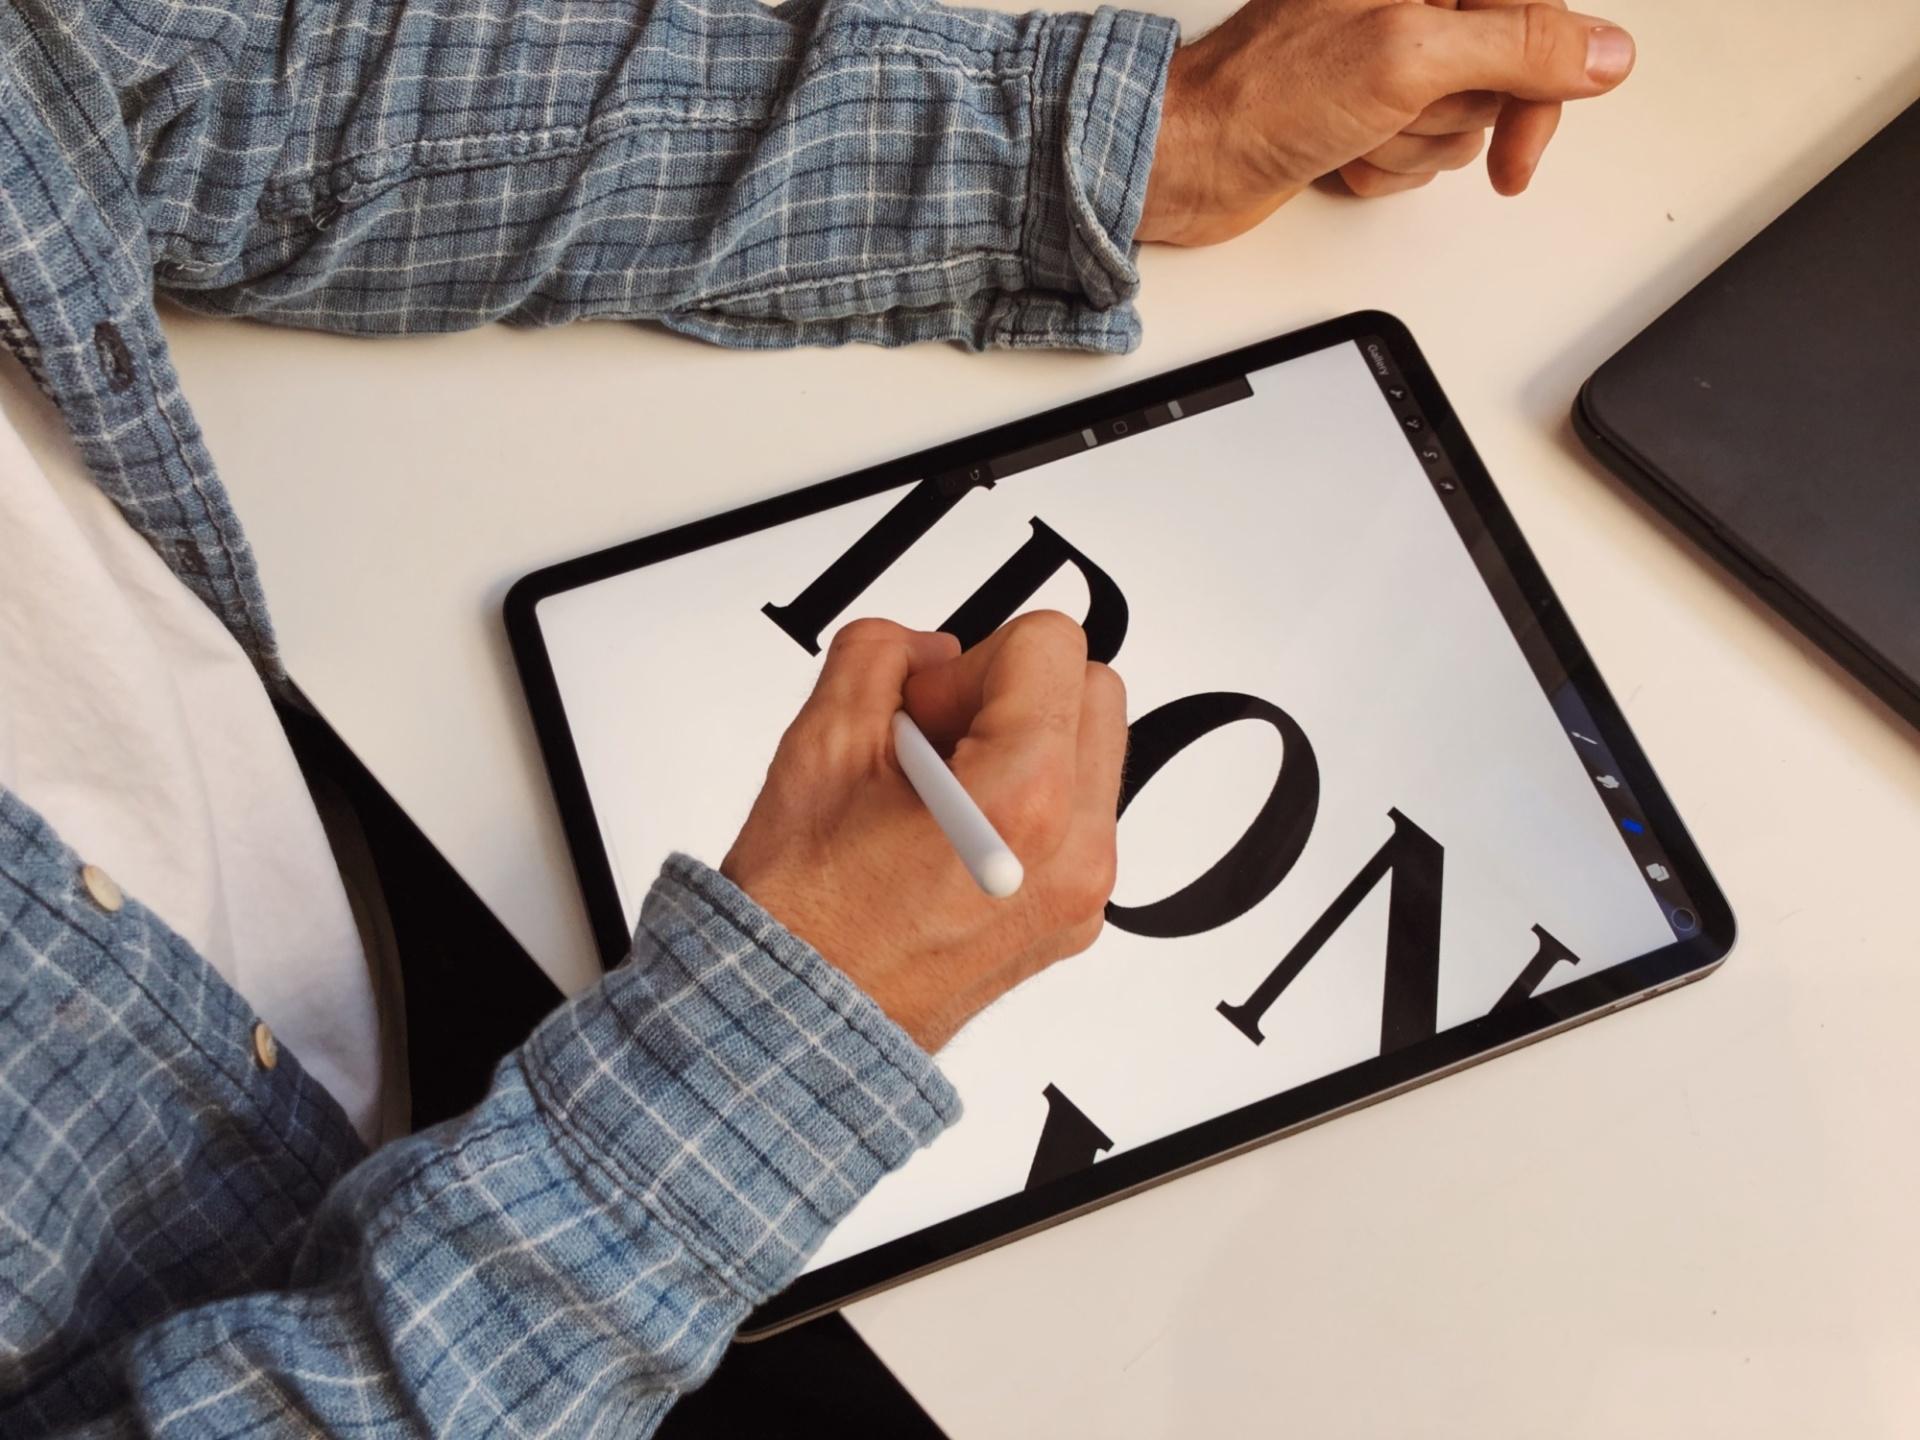 Senior Designer at Barefaced Studios sketching out the Ironworks Yard logo on an iPad.